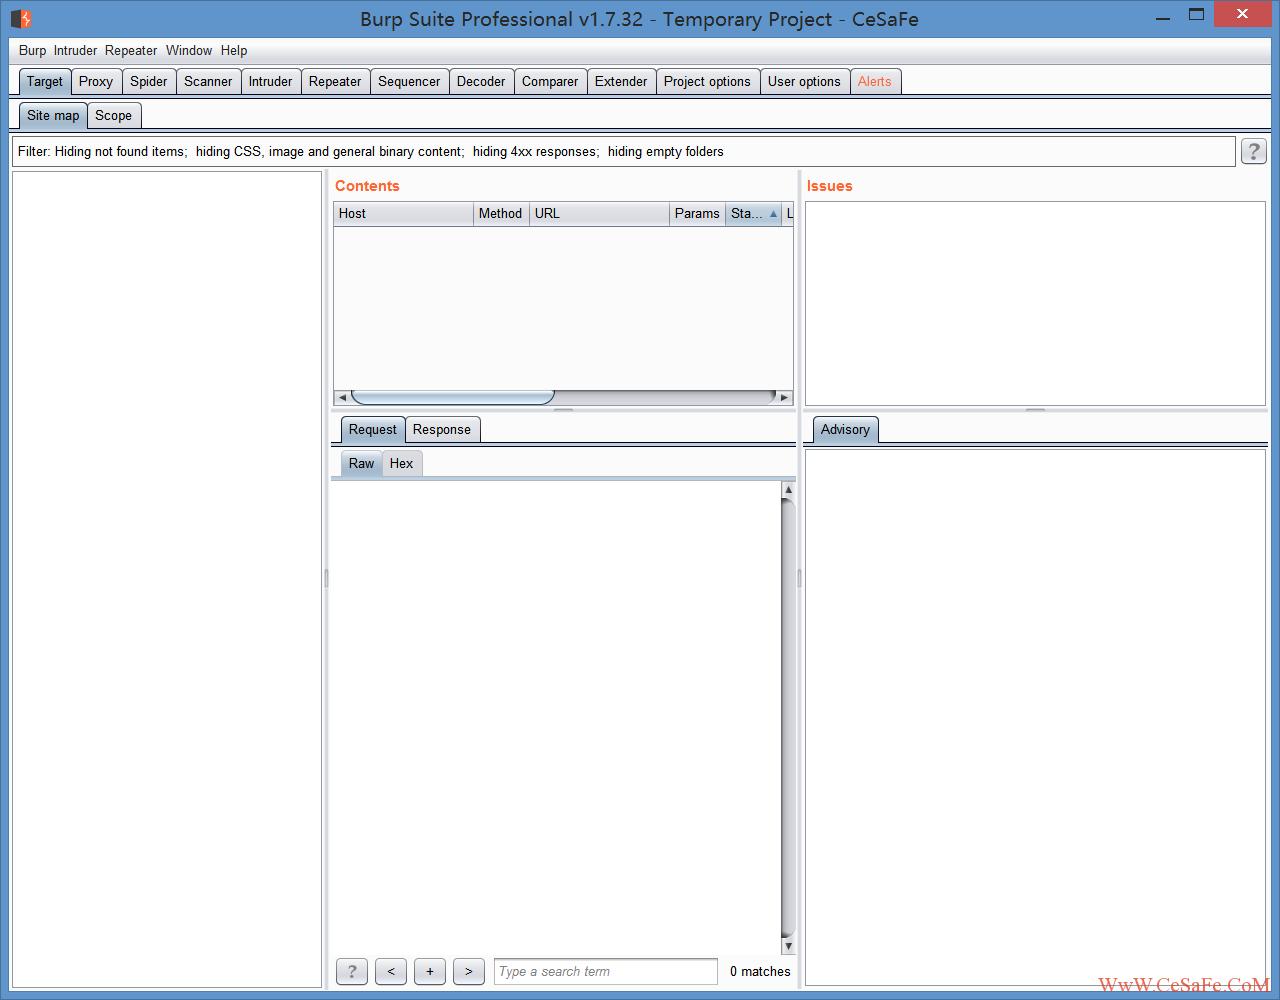 Burp Suite Pro Loader&Keygen Burp Suite Pro v1.7.32 永久破解版【黑客工具&网络安全工具】